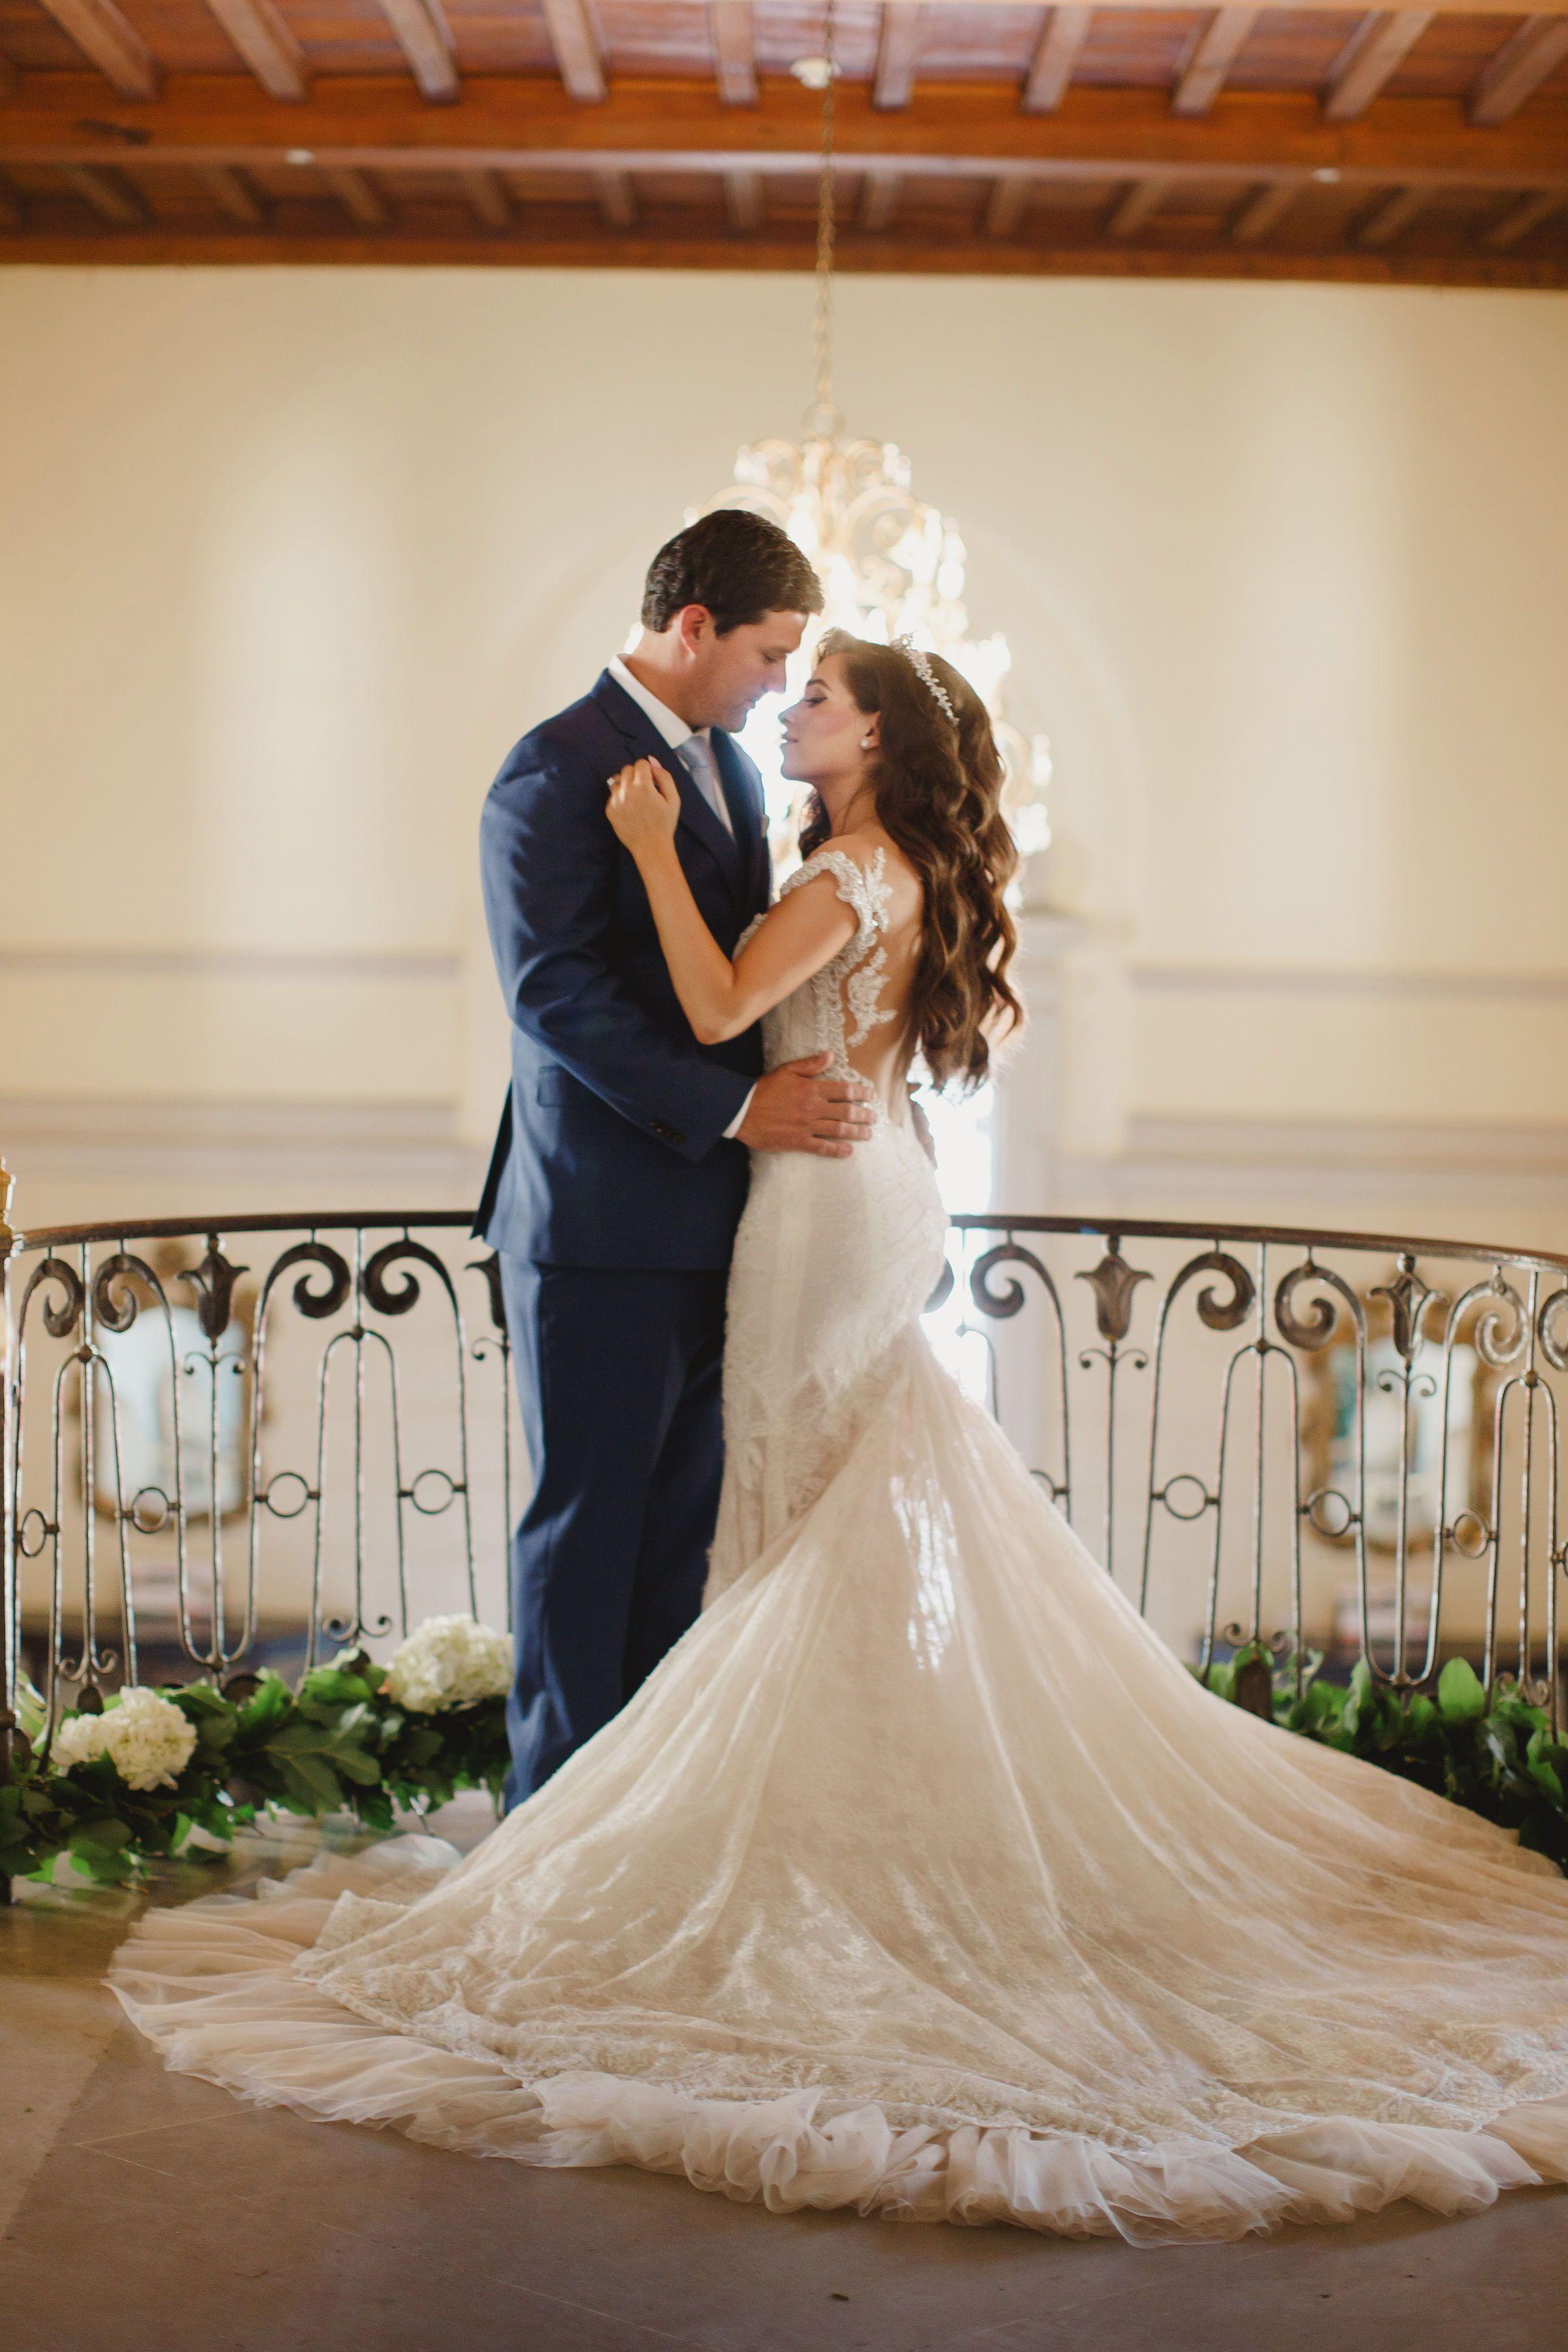 Luxury Fairytale Wedding At Oheka Castle In Long Island Ny Galia Lahav Blossom In 2020 Ballroom Wedding Dresses Whimsical Wedding Gown Vintage Inspired Wedding Gown